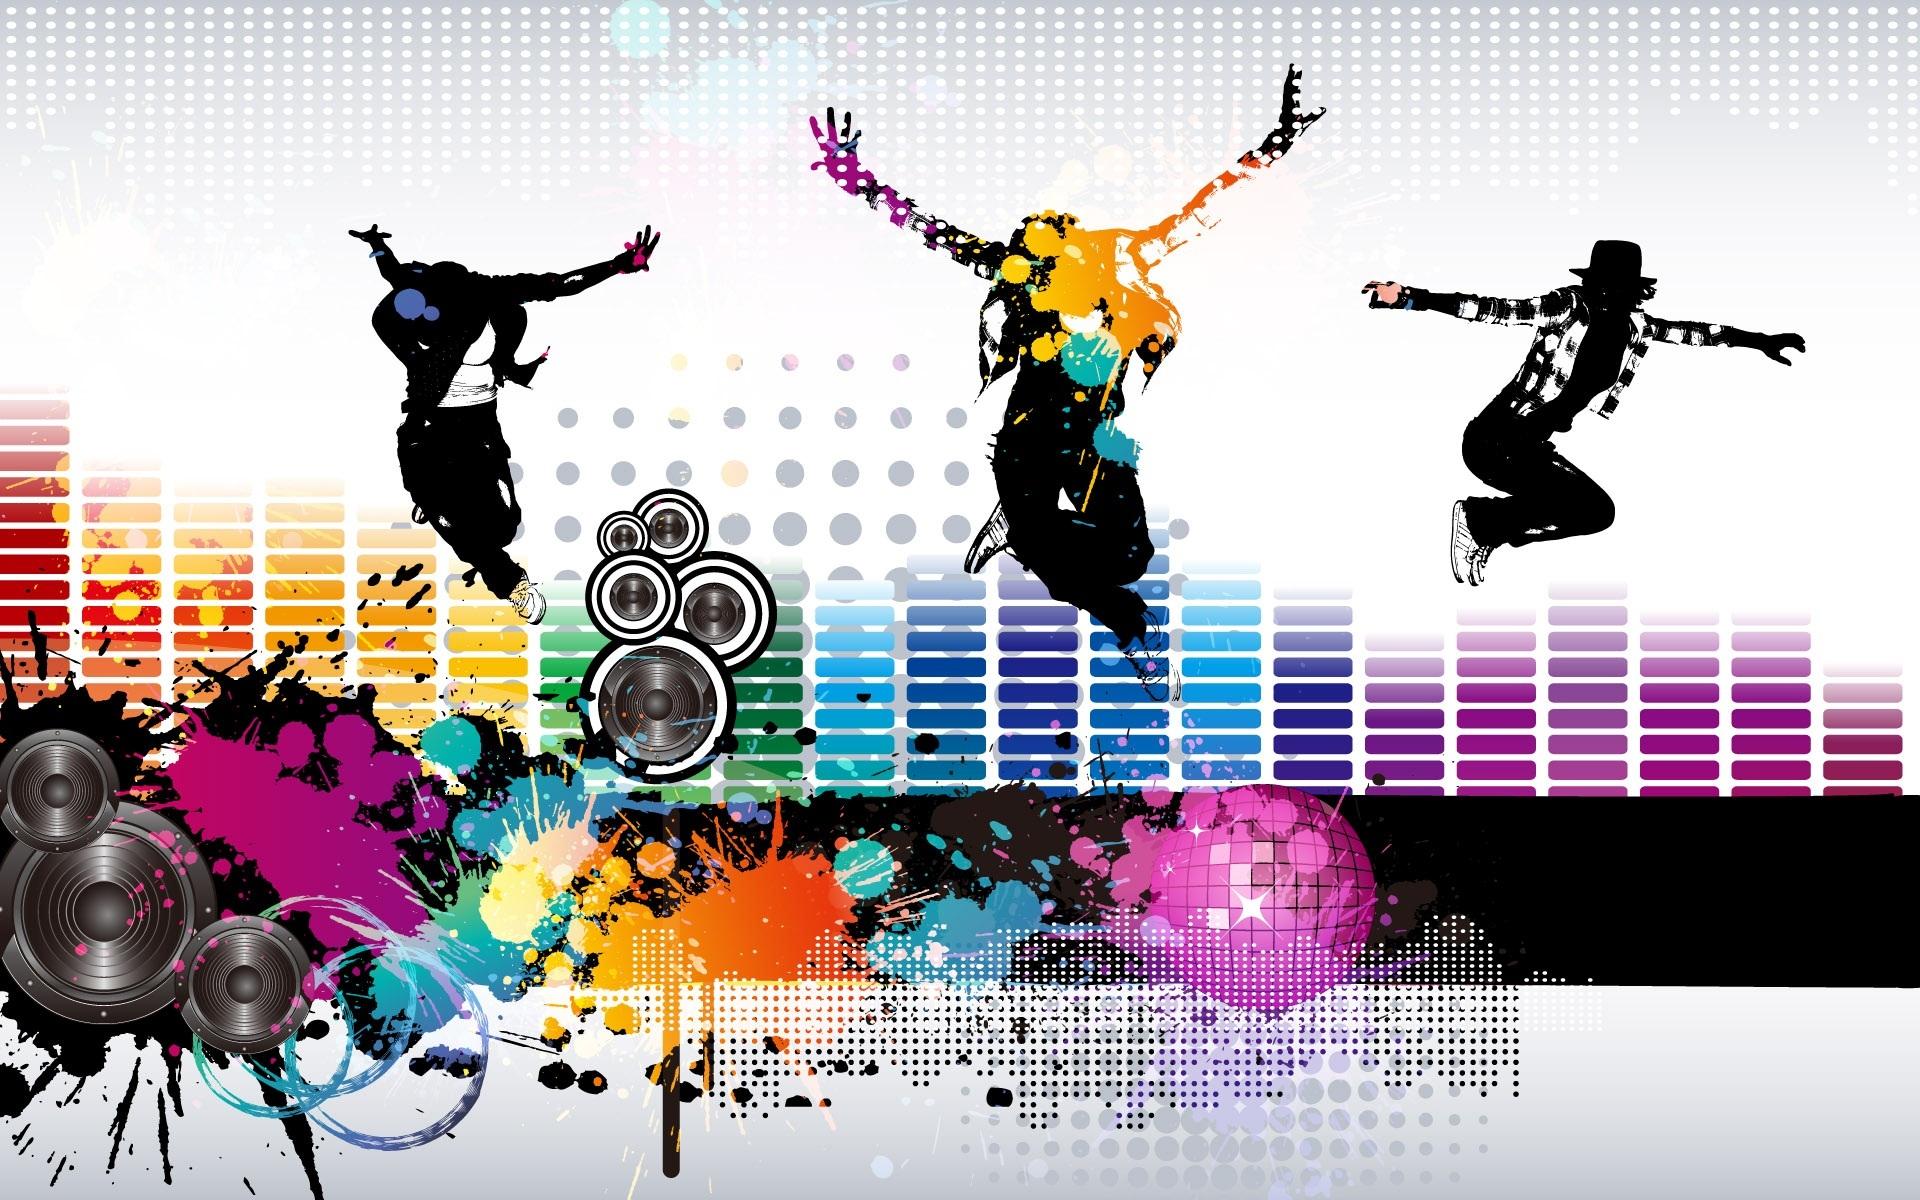 Feel_the_music